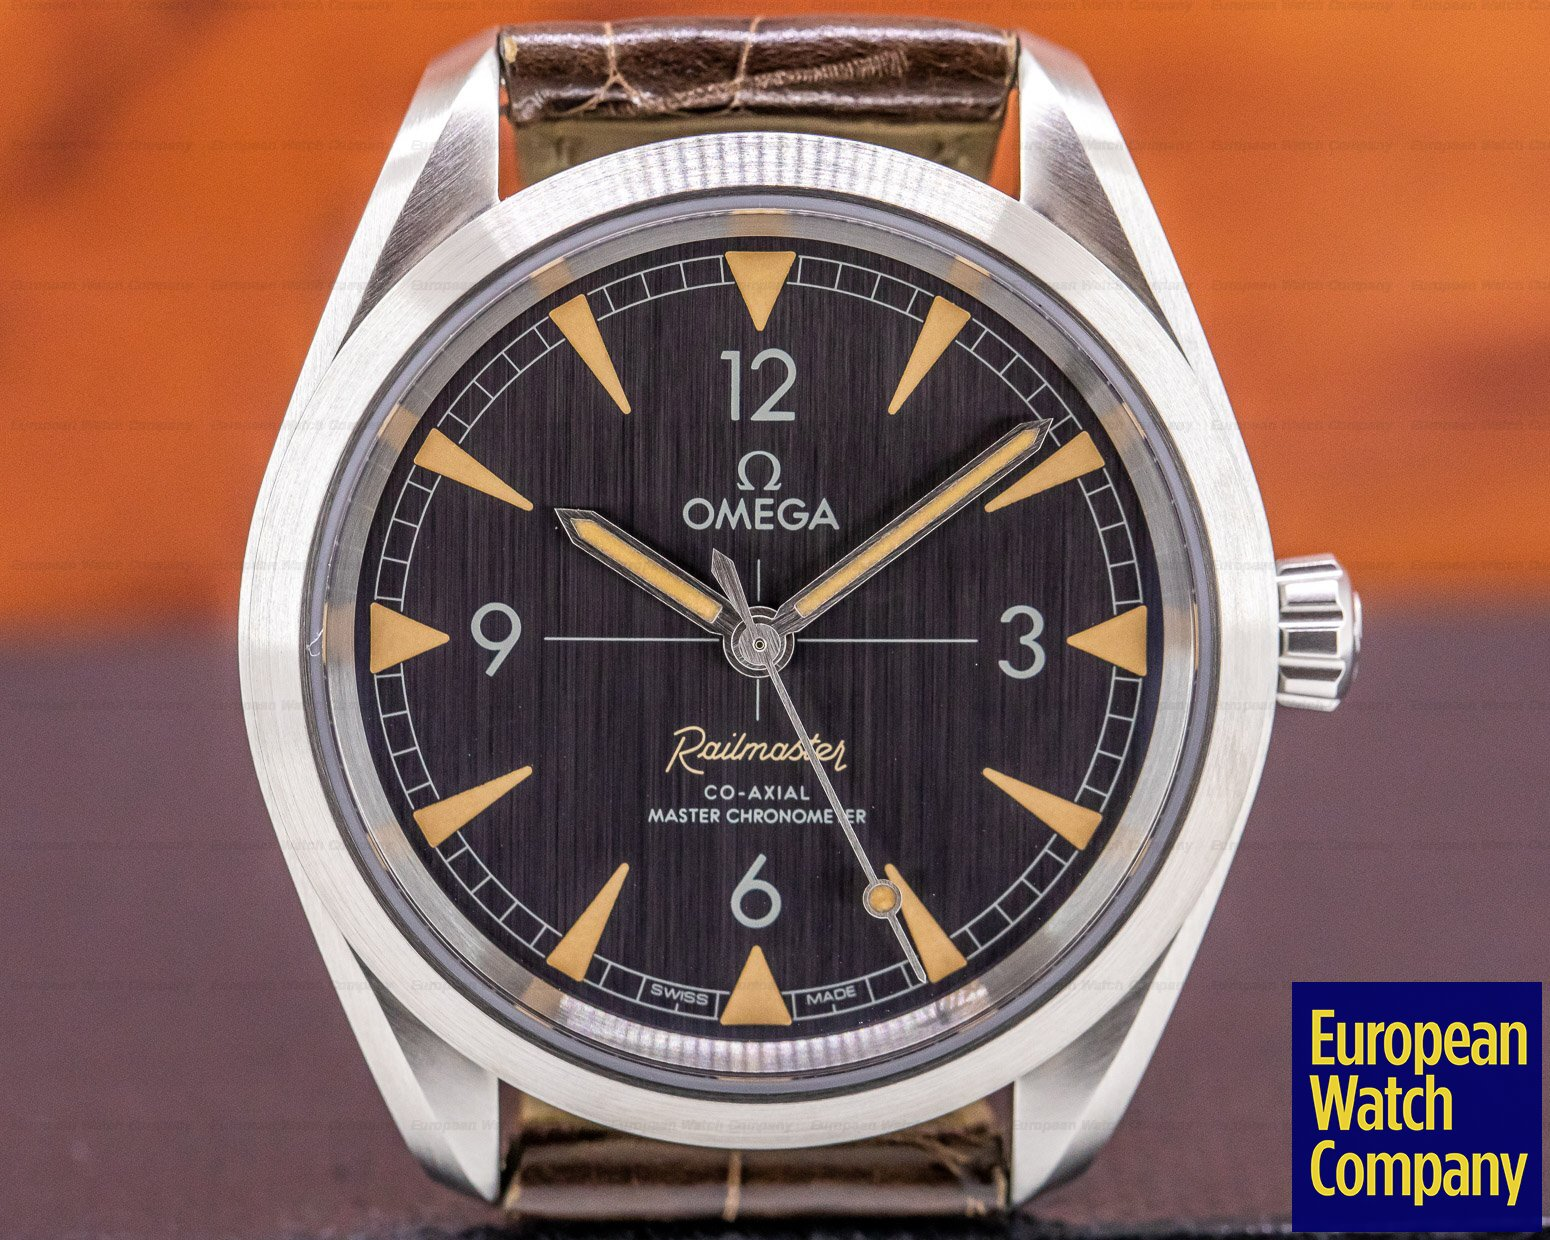 Omega 220.12.40.20.01.001 Railmaster Master Chronometer SS Co Axial